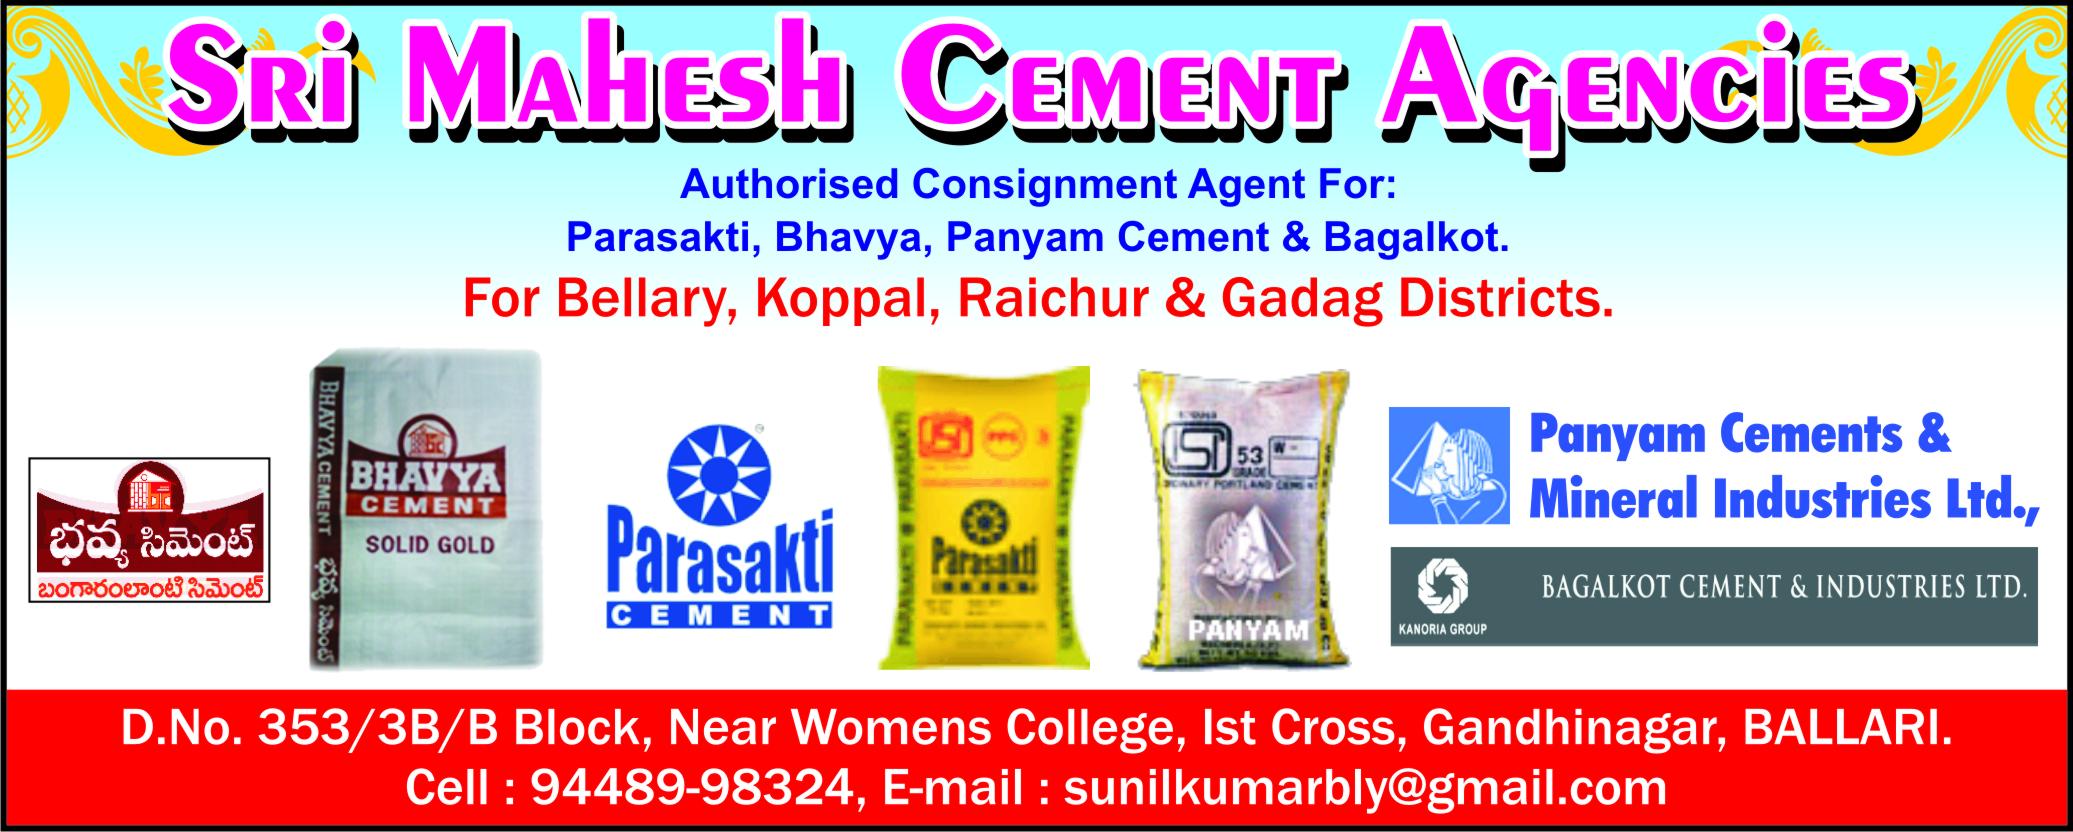 Sri Mahesh Cement Agencies